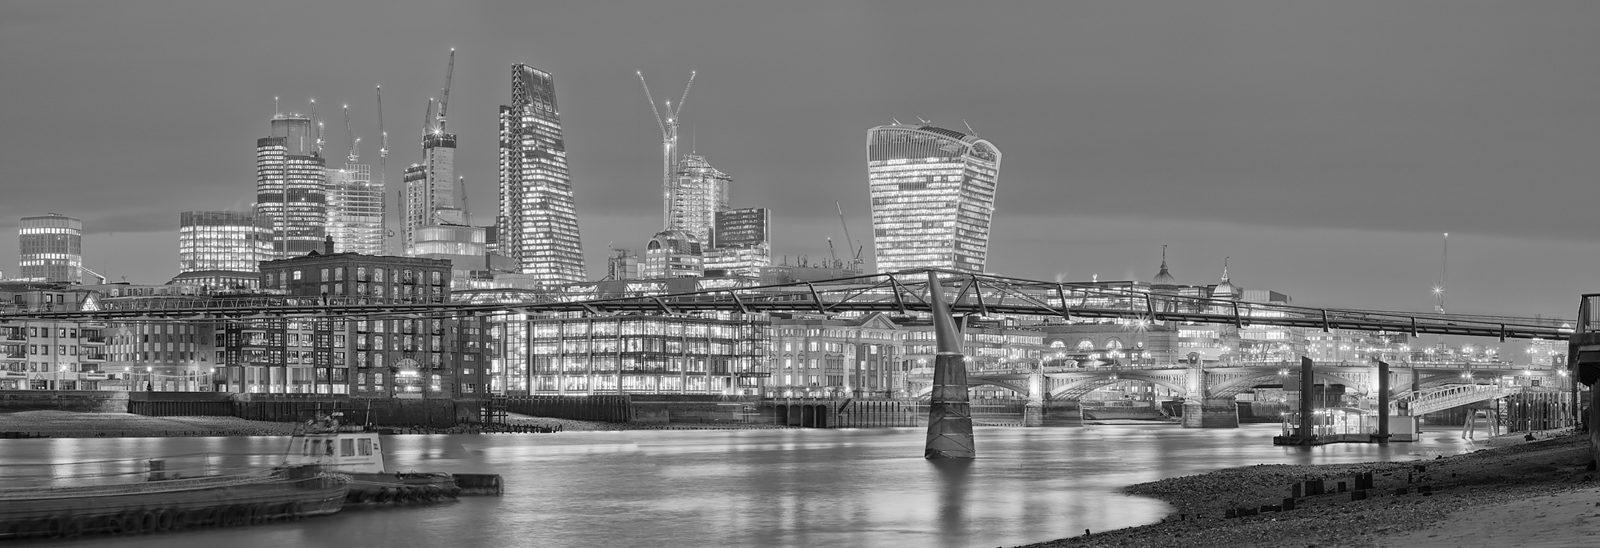 Low Tide at Millennium Bridge Acrylic - City of London Fine Art Print